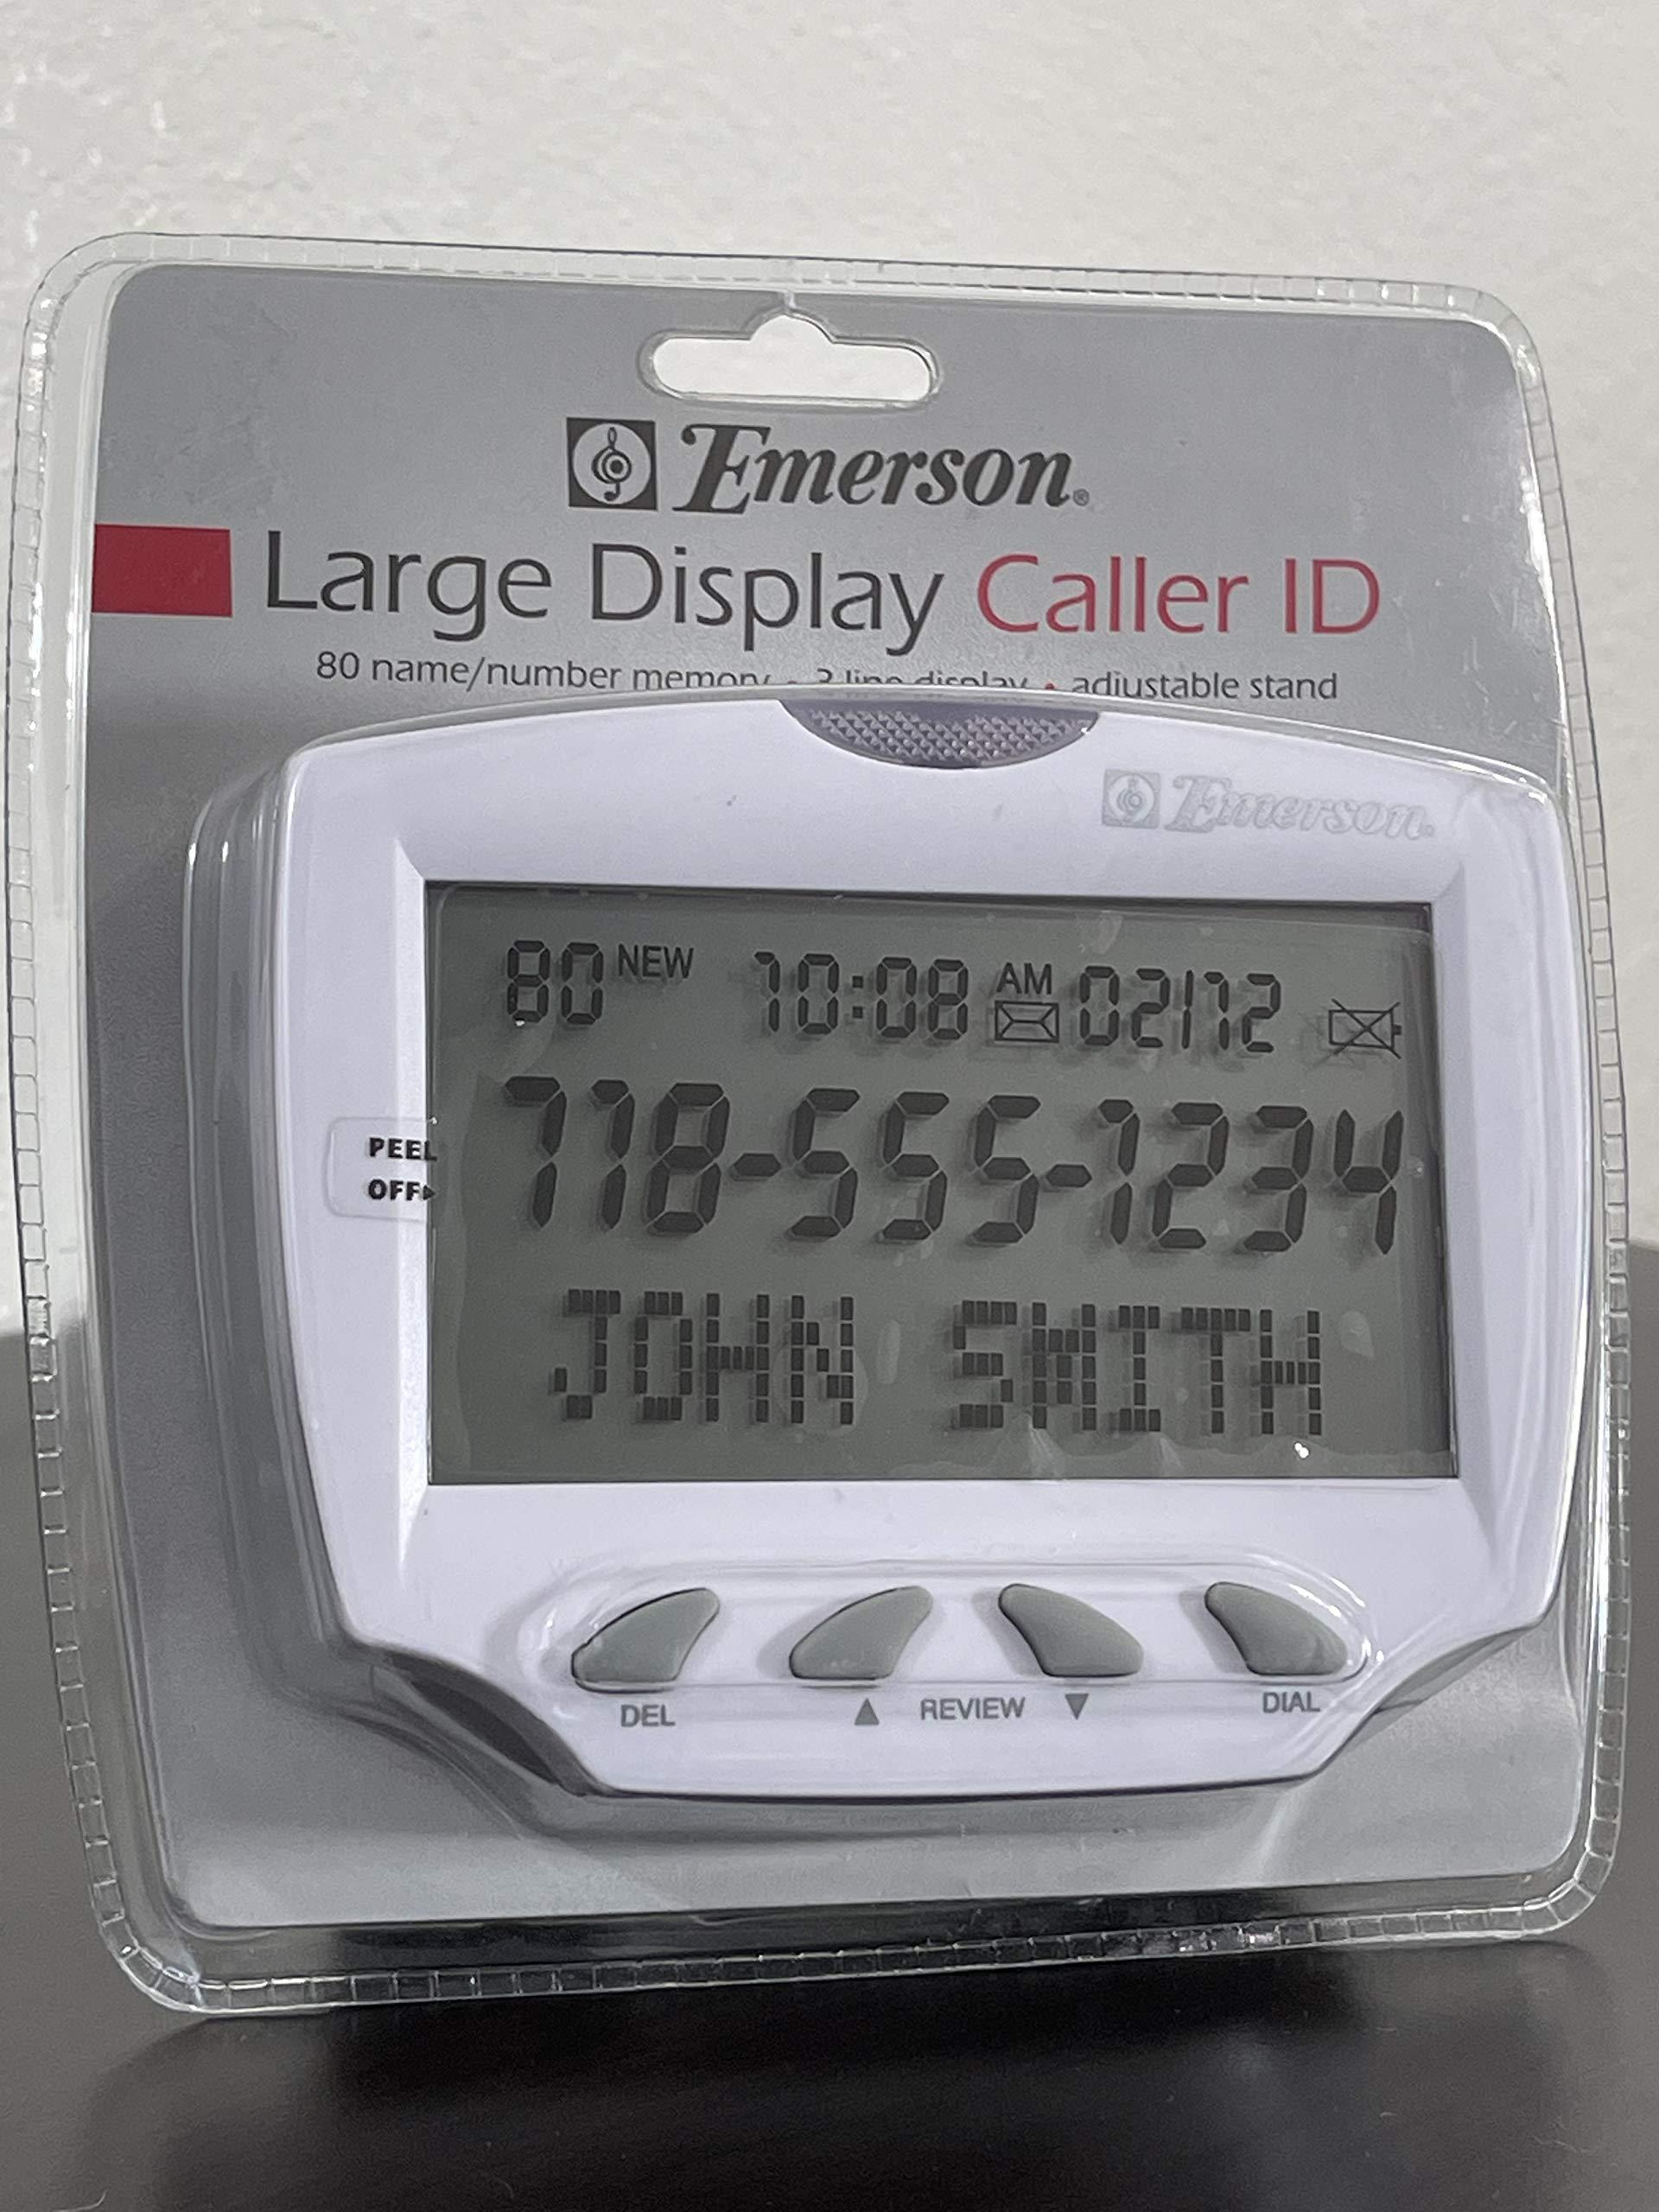 Emerson EM50LD Large Display Caller ID